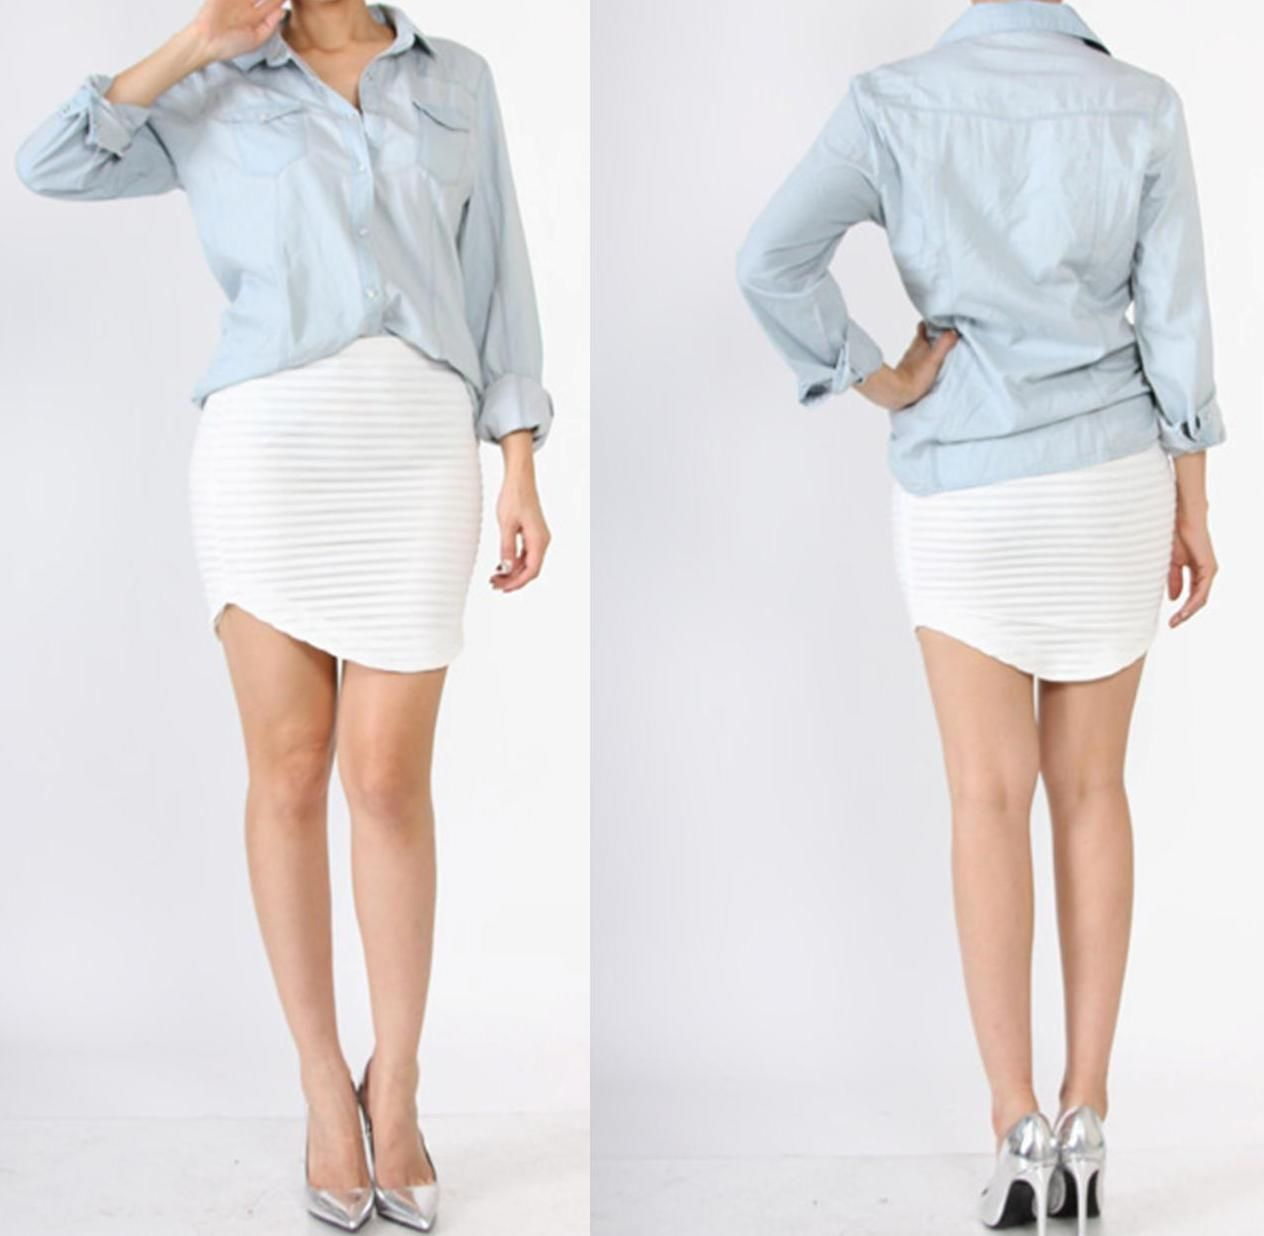 Long sleeve light blue denim shirt fits true to size working